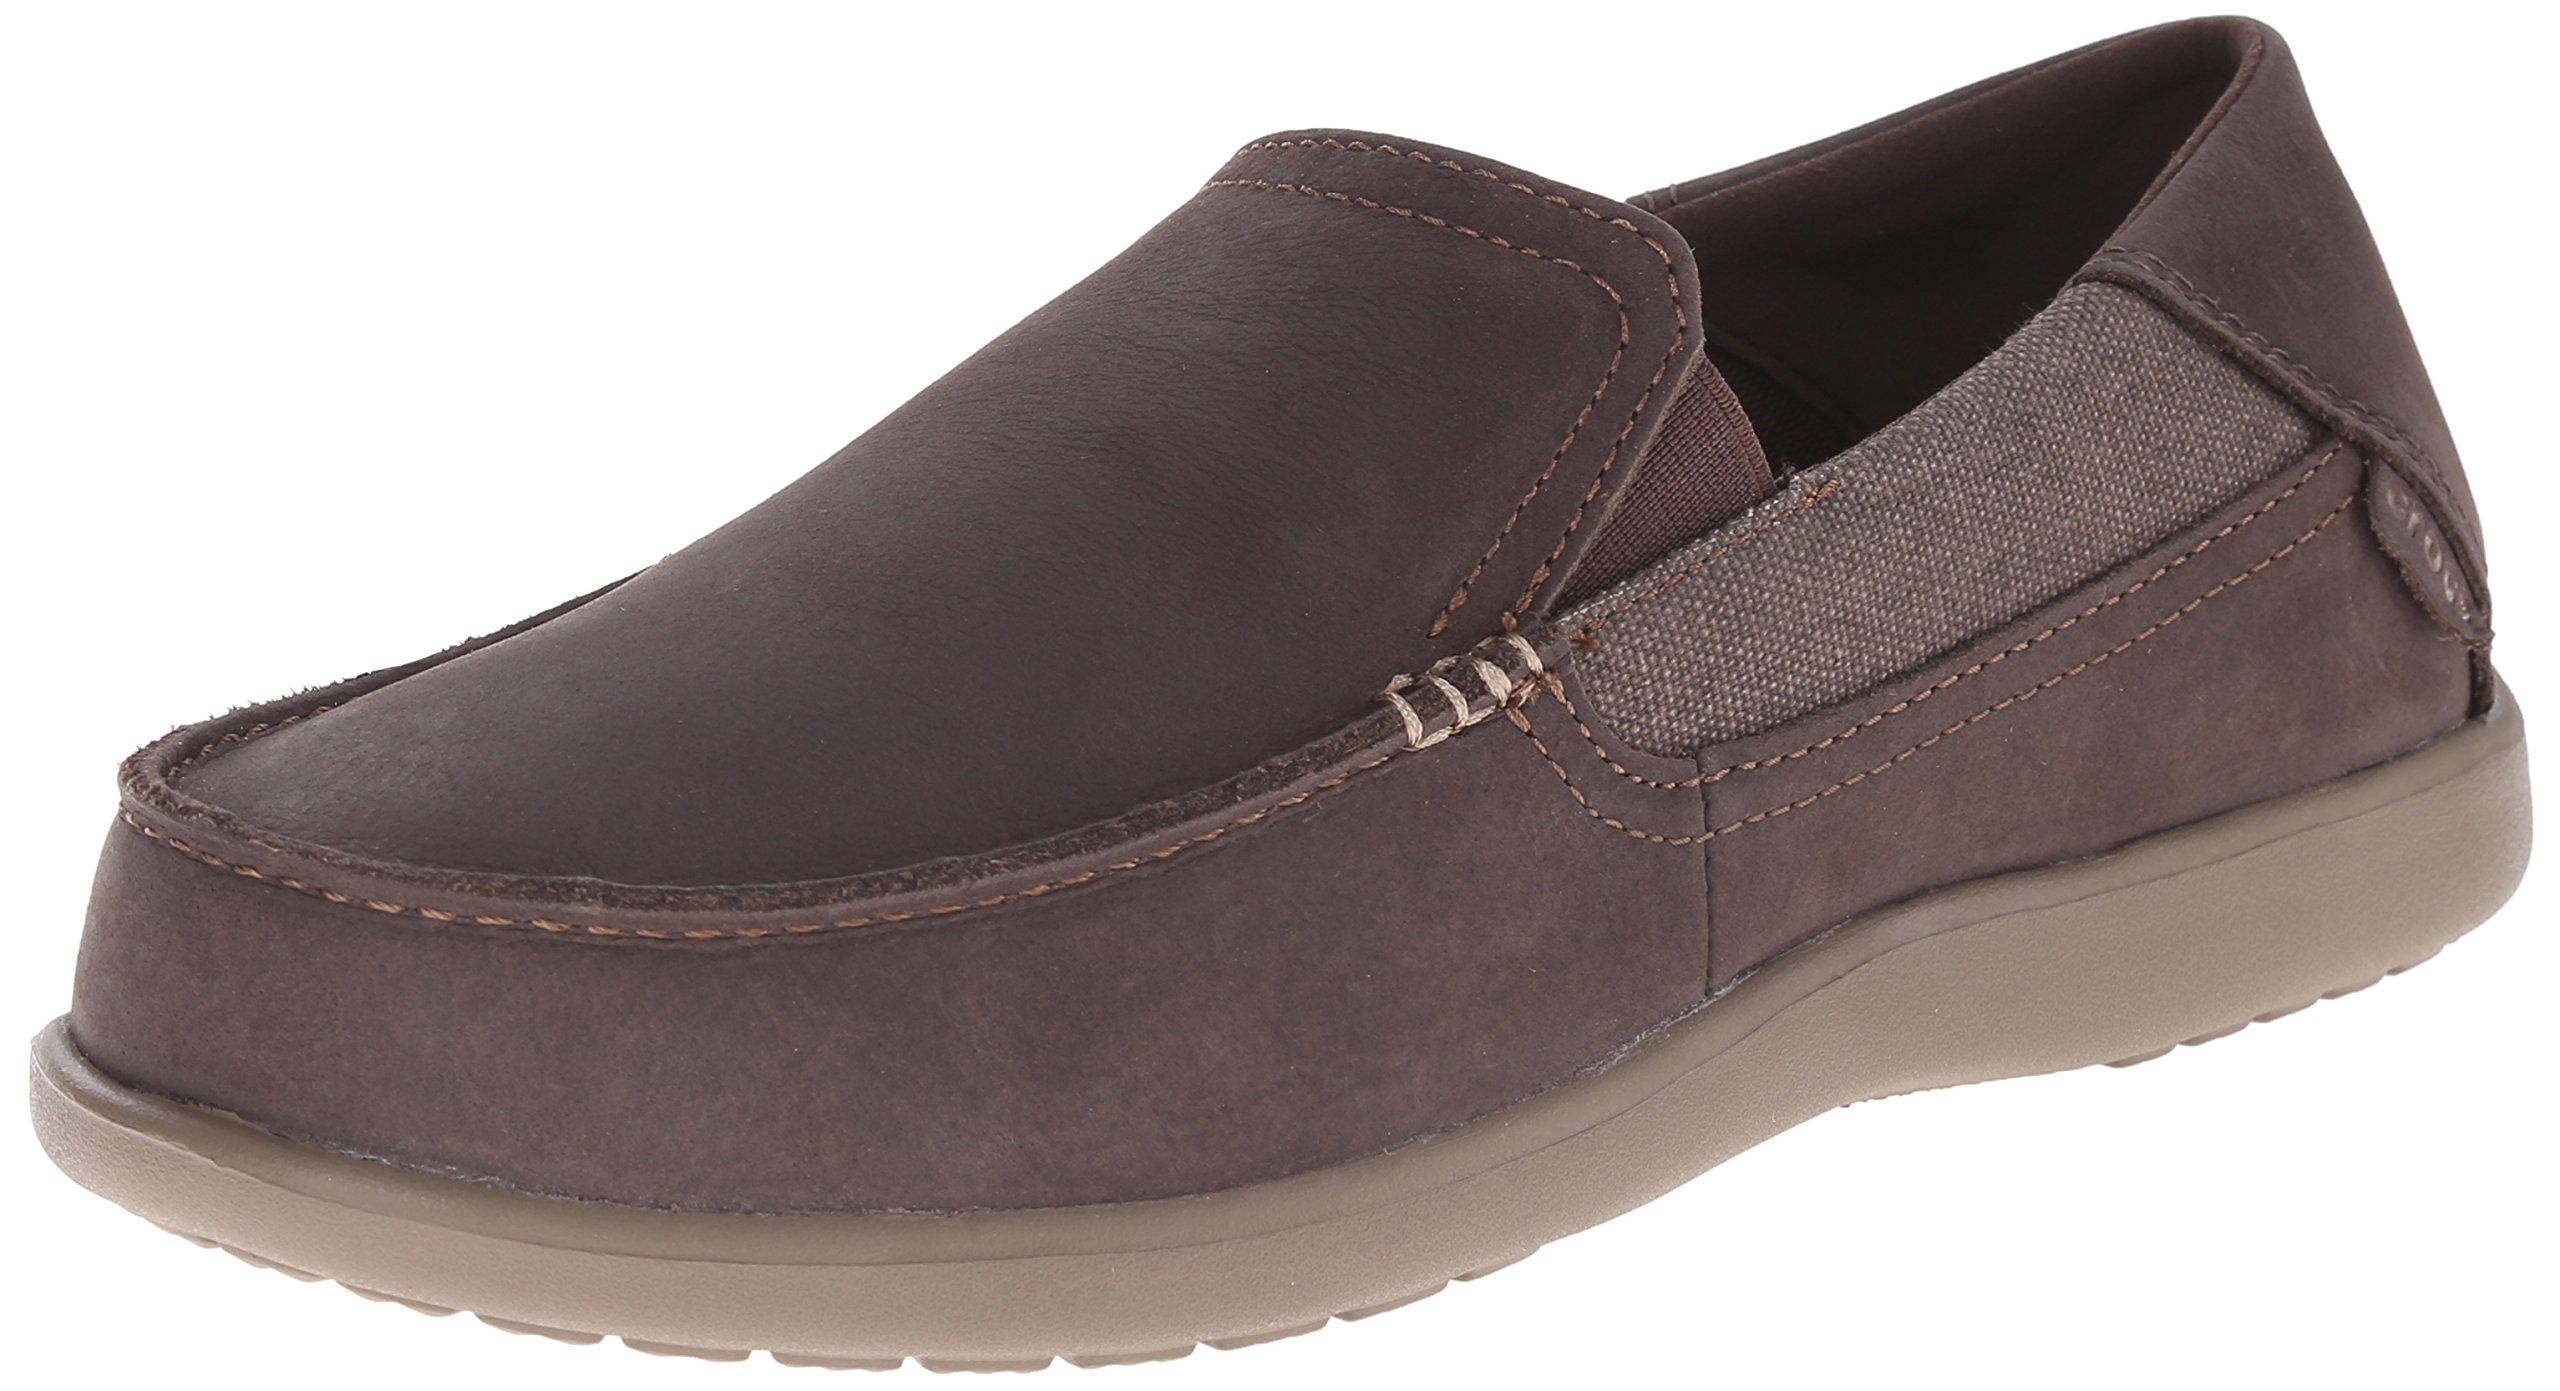 Crocs Men's Santa Cruz 2 Luxe Leather M Slip-On Loafer, Espresso/Walnut, 12 M US